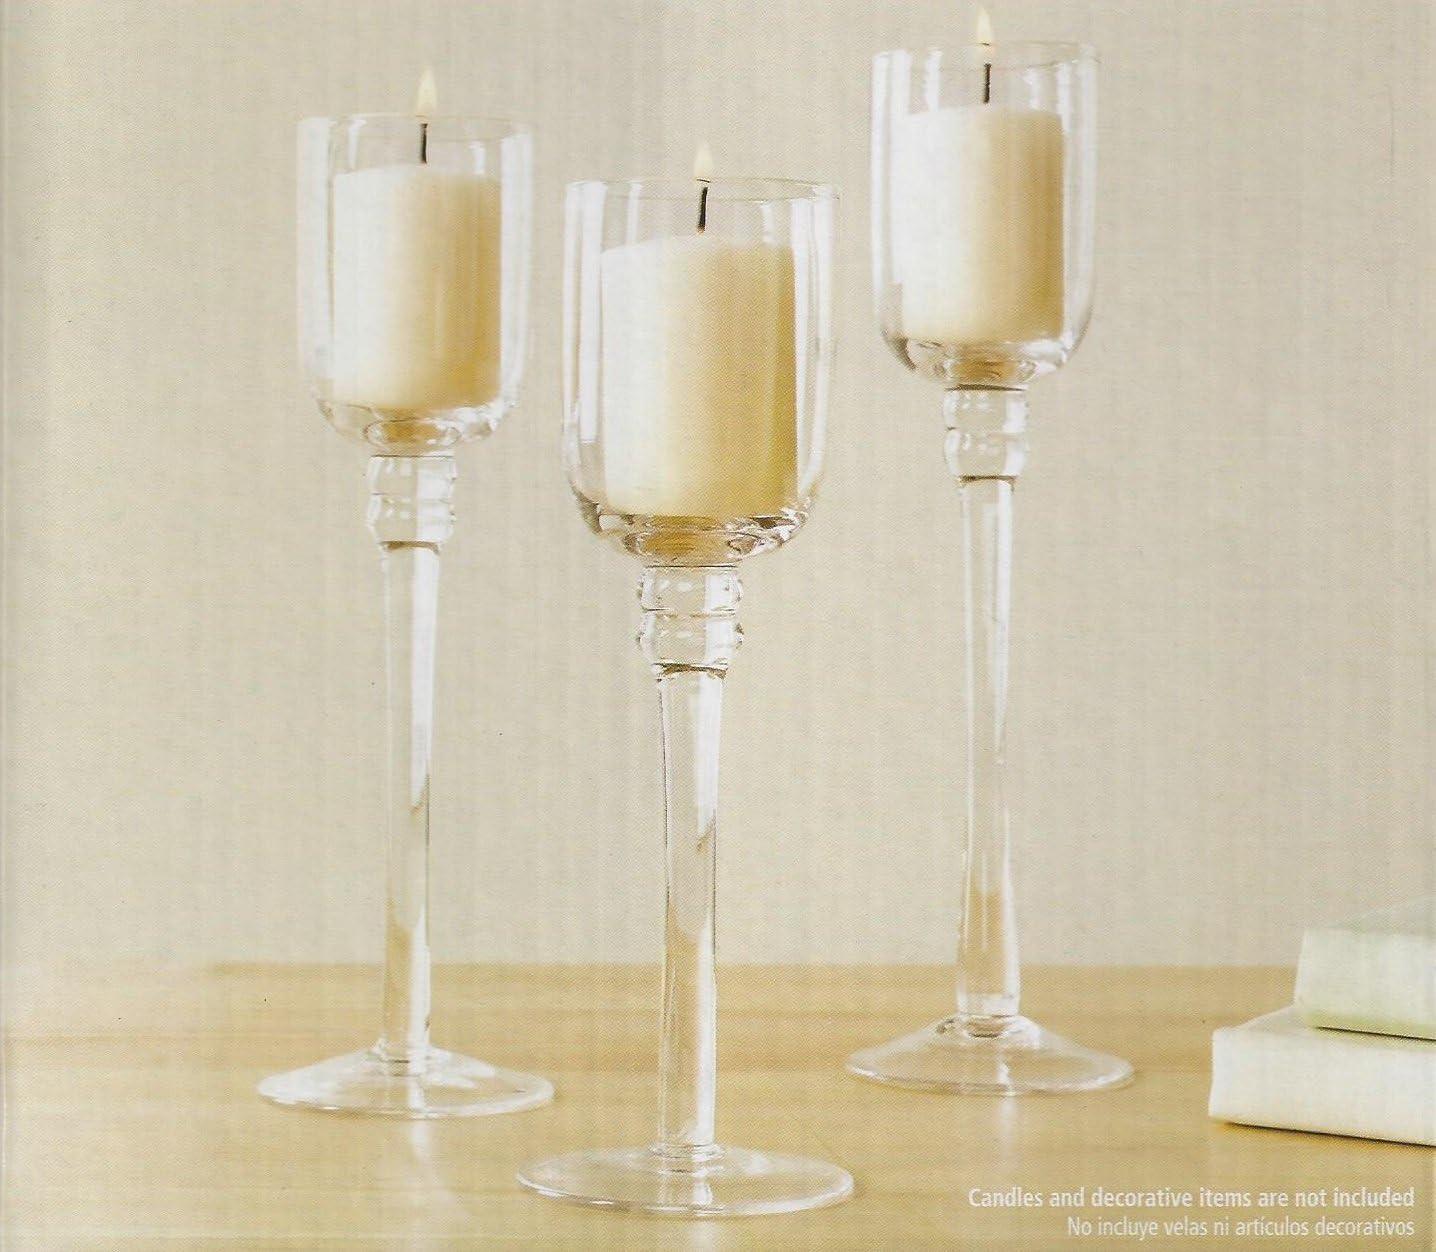 Amazon Com Mainstays Votive Tealight Holder Set 3 Glass Holders Variety Of Heights Home Kitchen